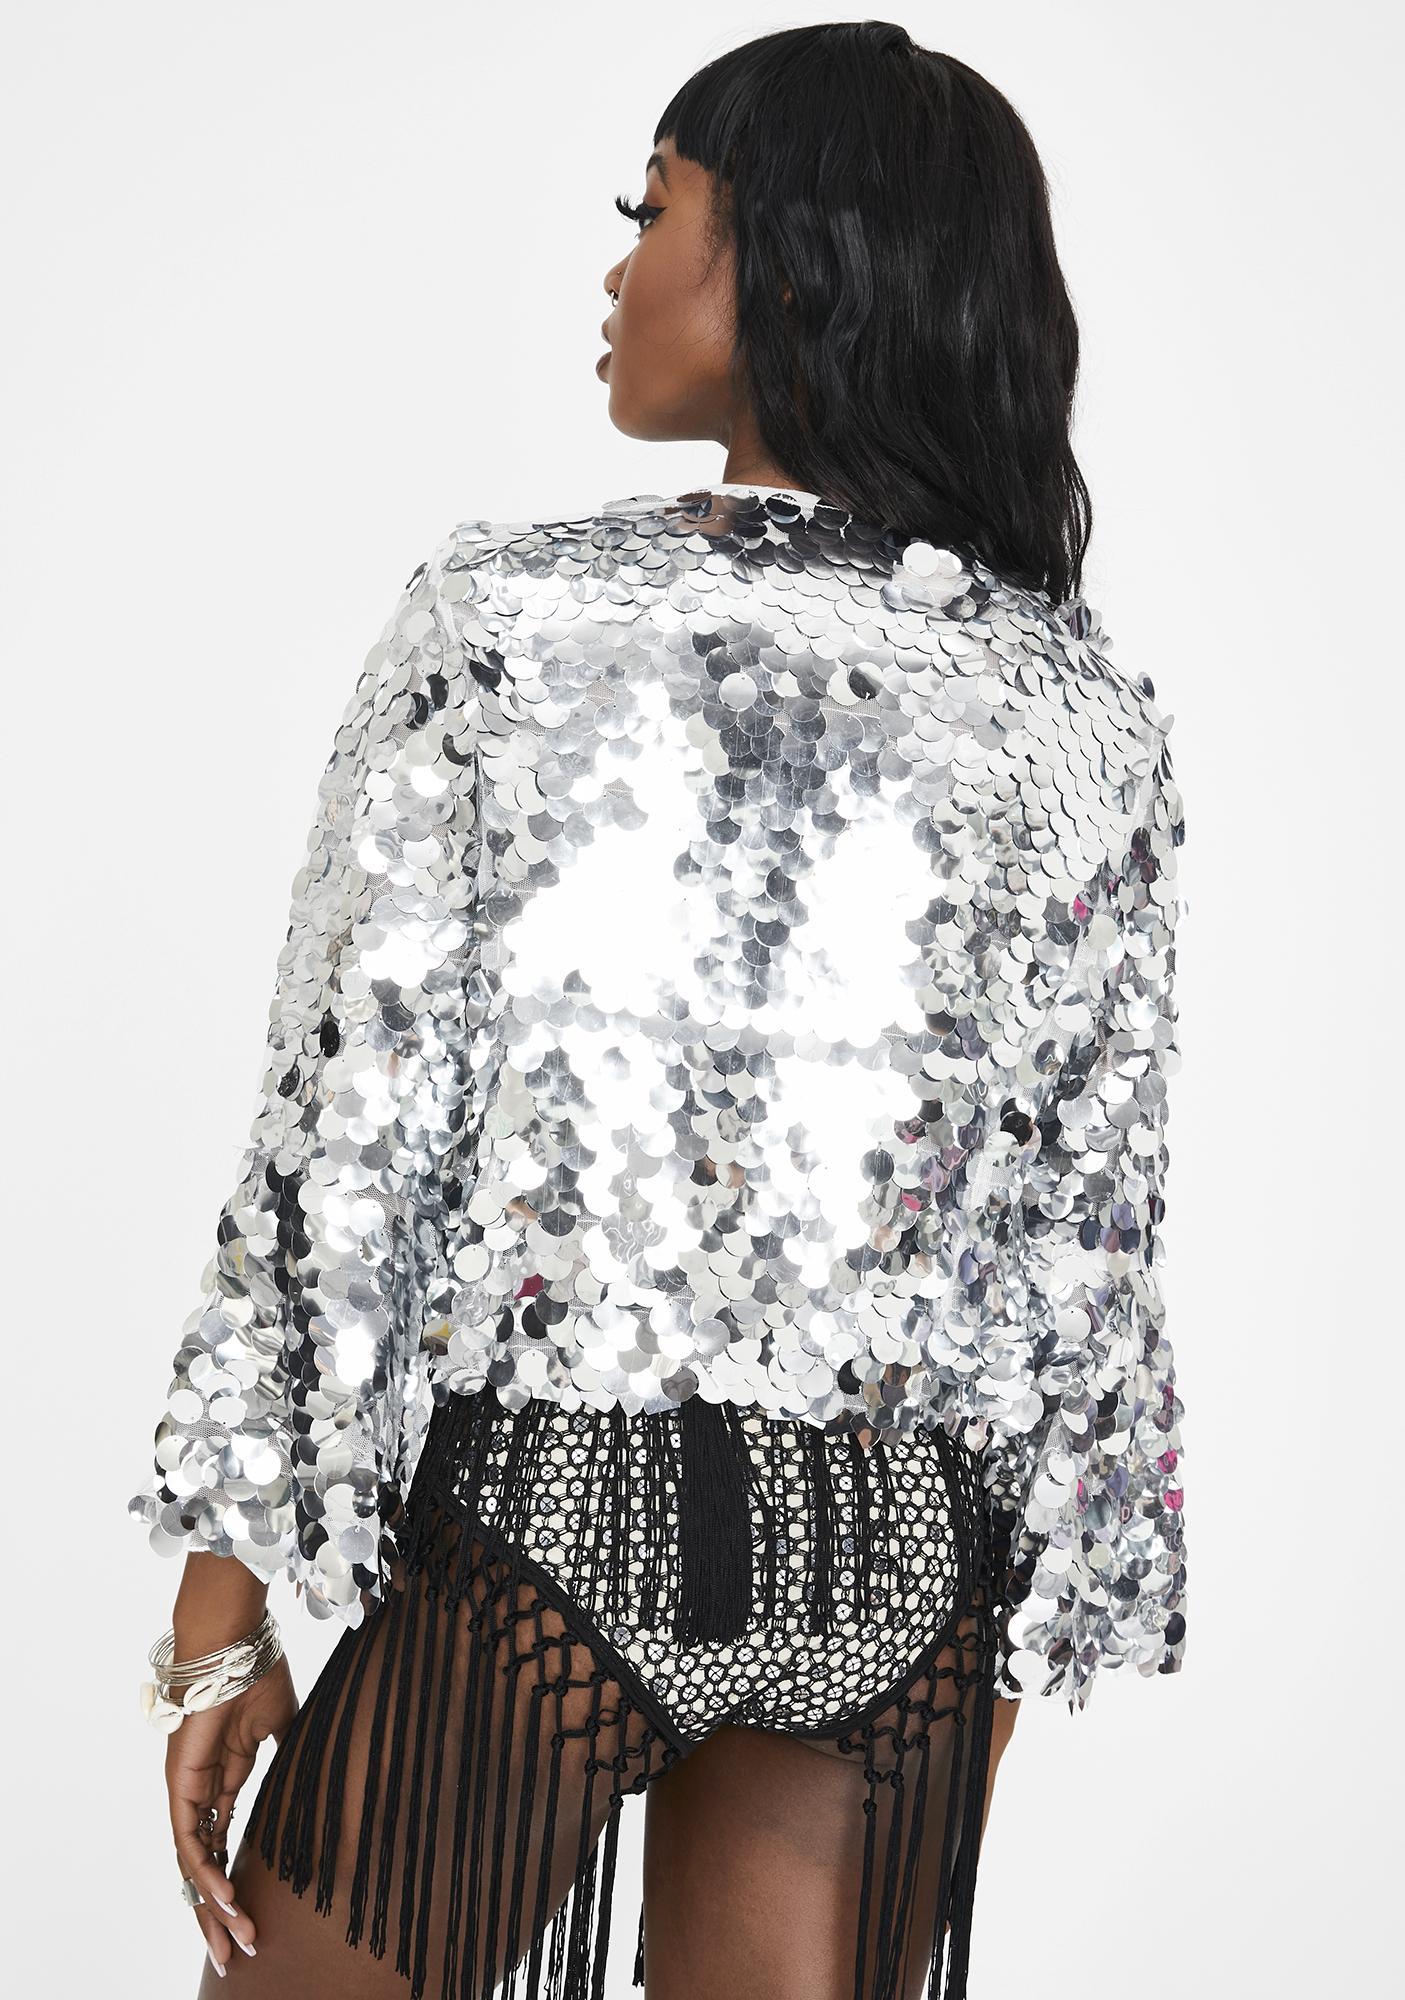 EastnWest Riviera Silver Dollar Sequin Jacket